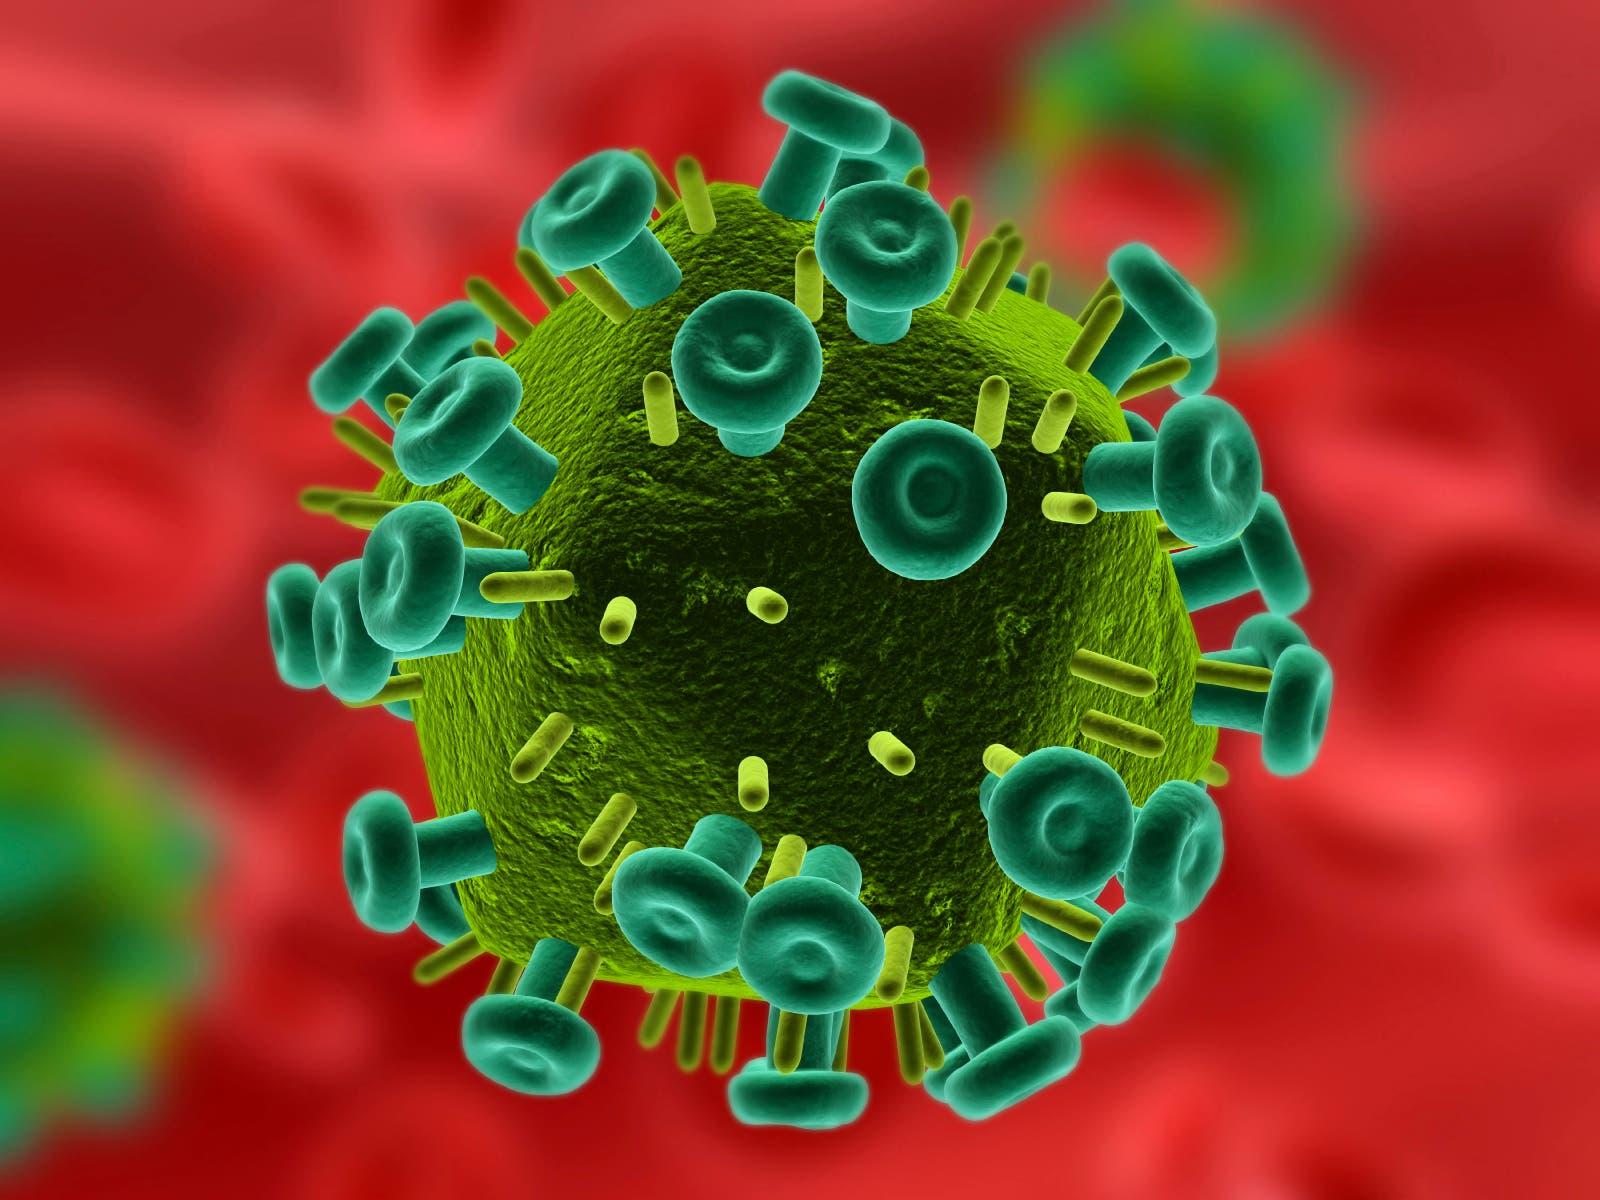 HI-Virus